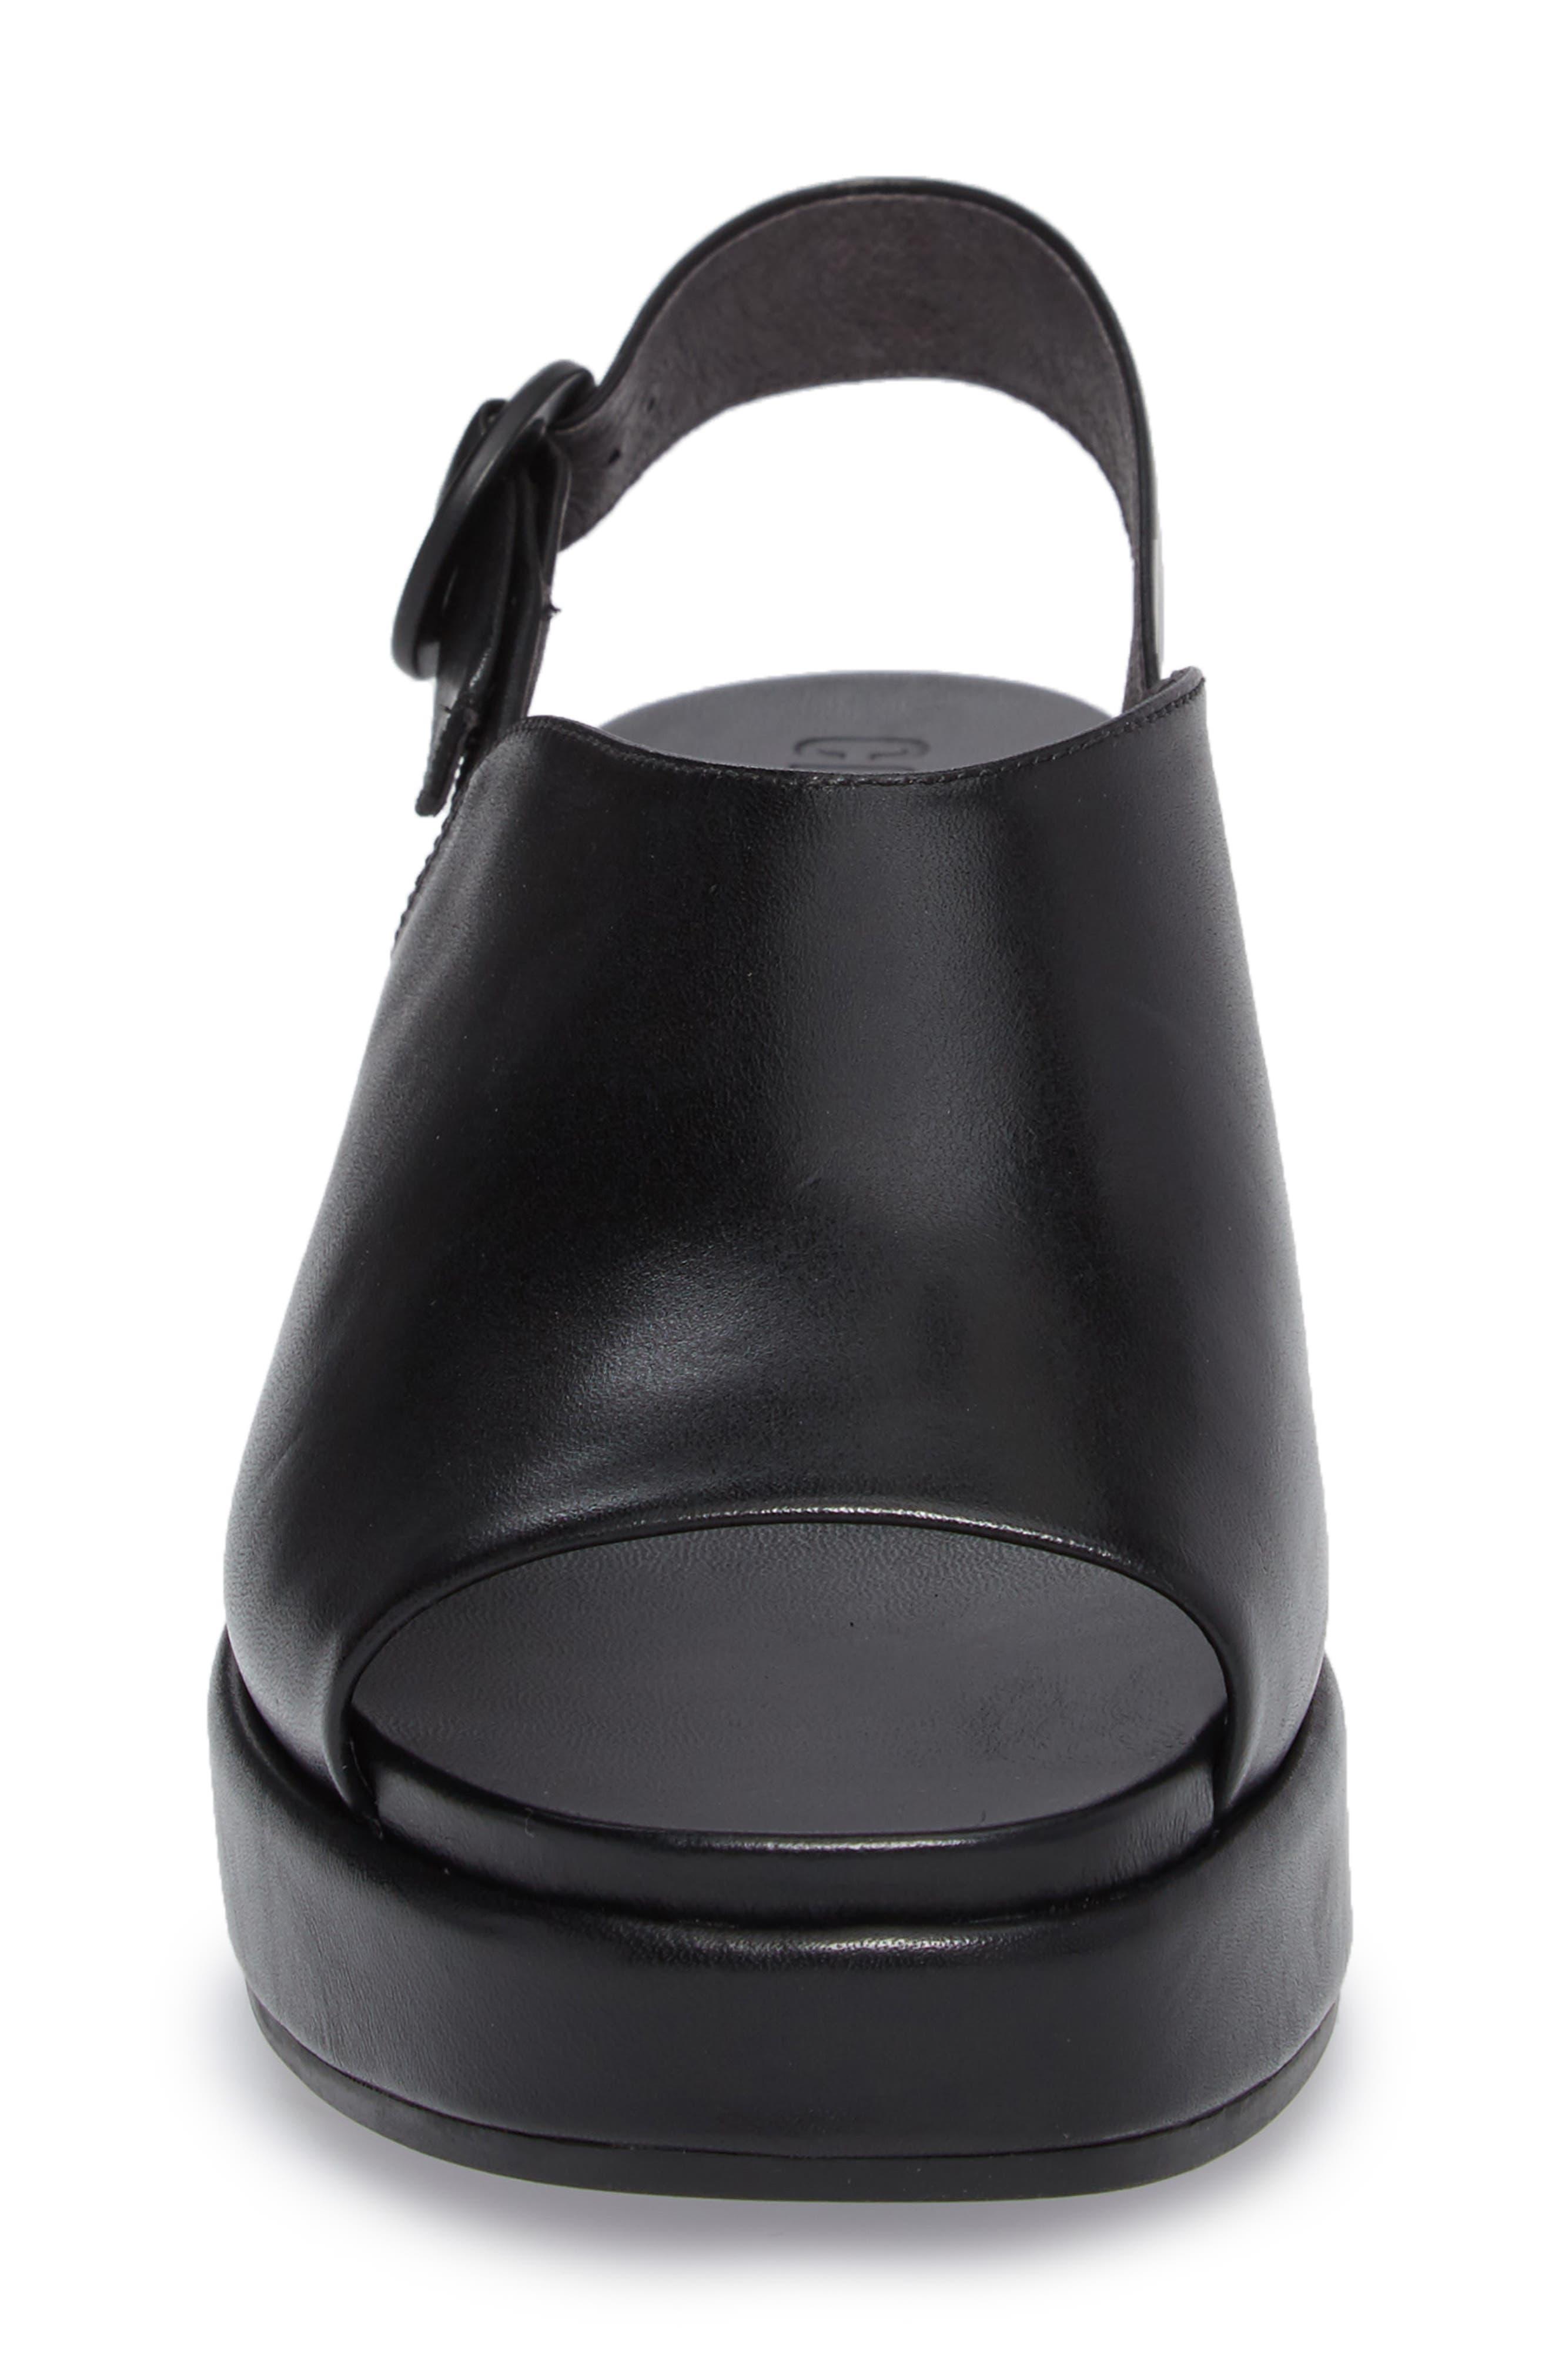 Misia Slingback Platform Wedge Sandal,                             Alternate thumbnail 4, color,                             Black Leather